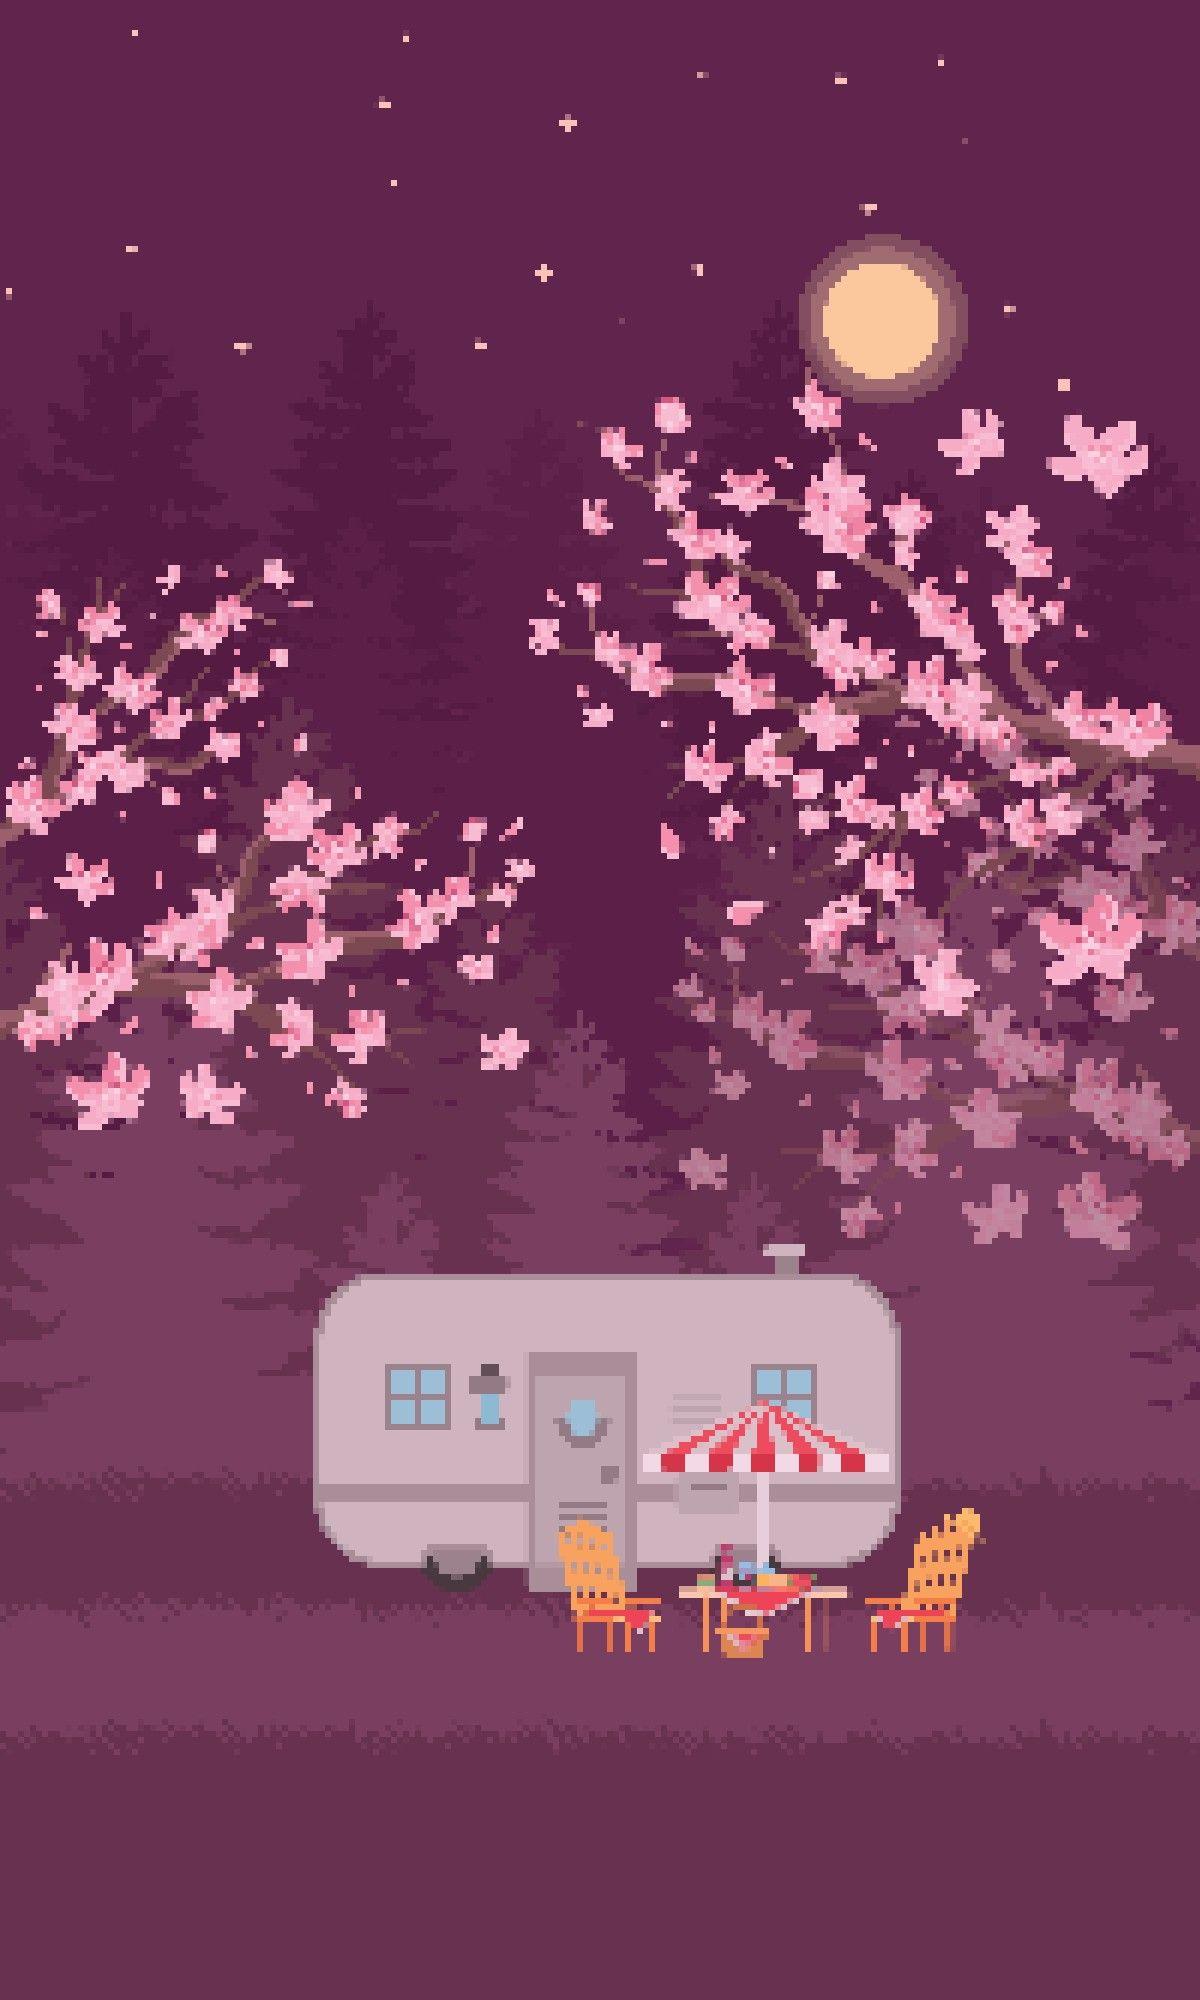 Stardew Valley Inspired Art Pam And Penny Trailer Home Phanachudoll Stardew Valley Pixel Art Phone Wallpaper